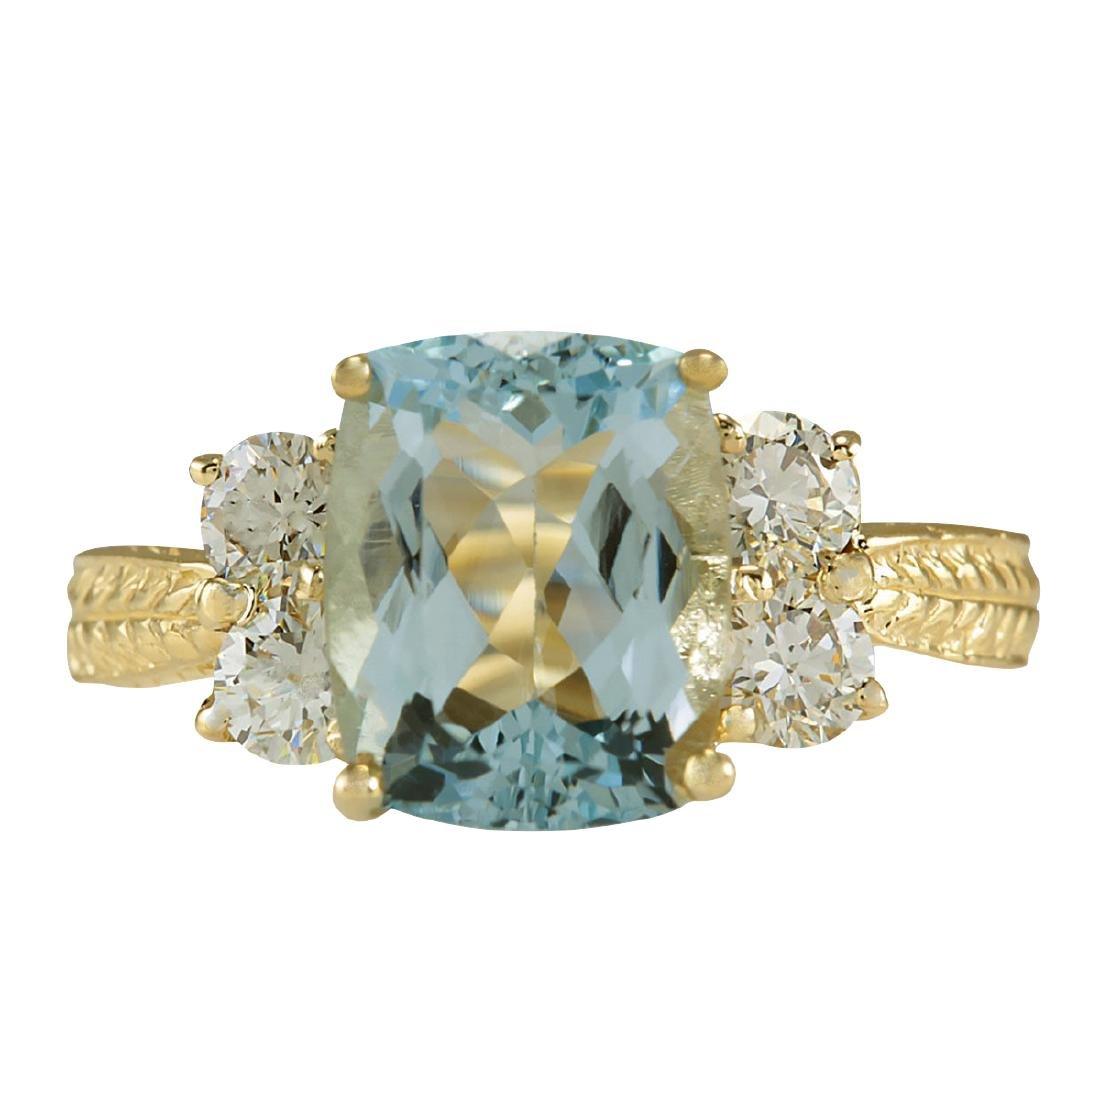 3.67CTW Natural Aquamarine And Diamond Ring In 18K